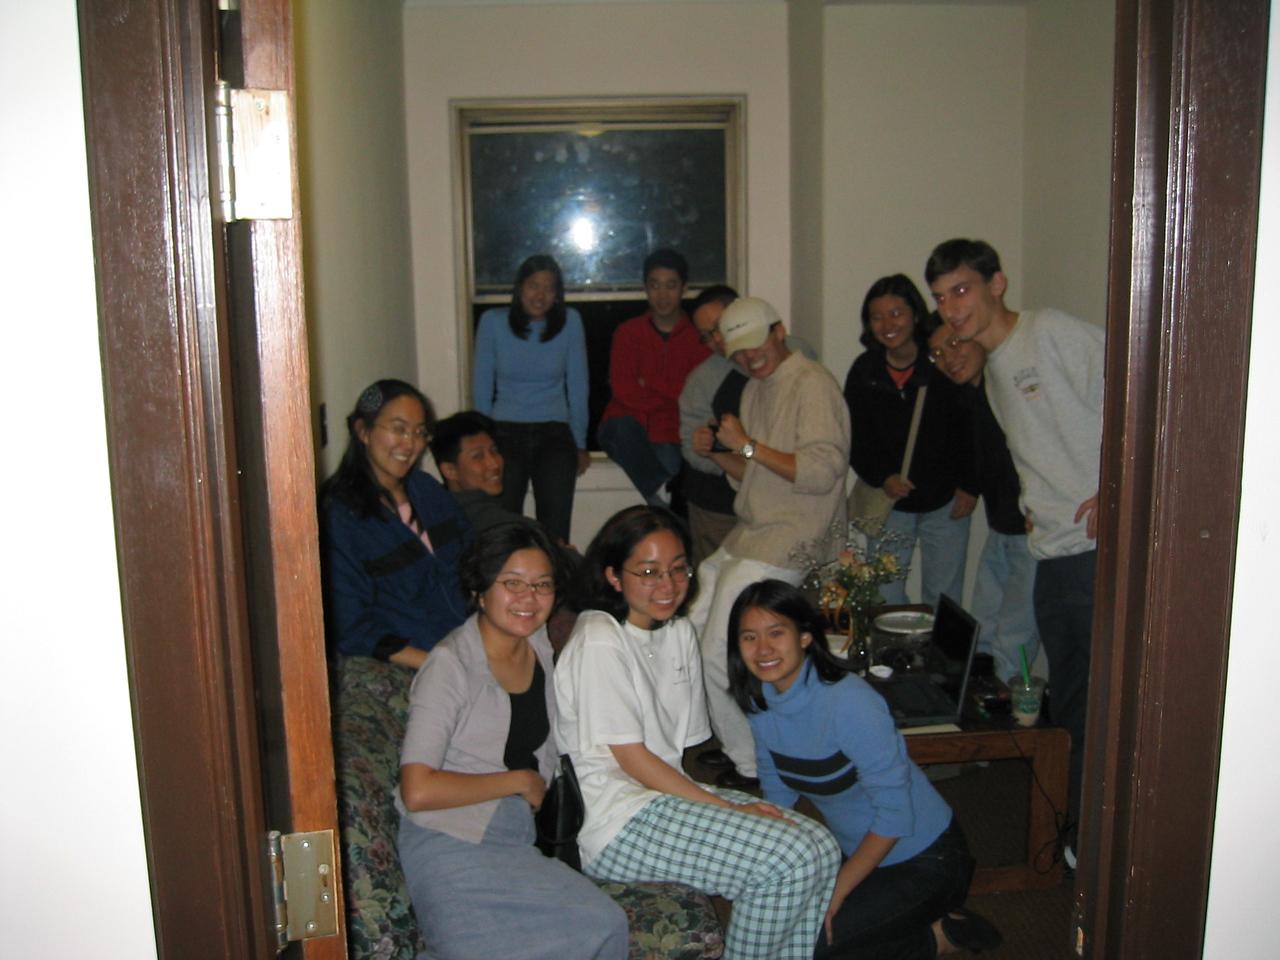 Group photo through doorway